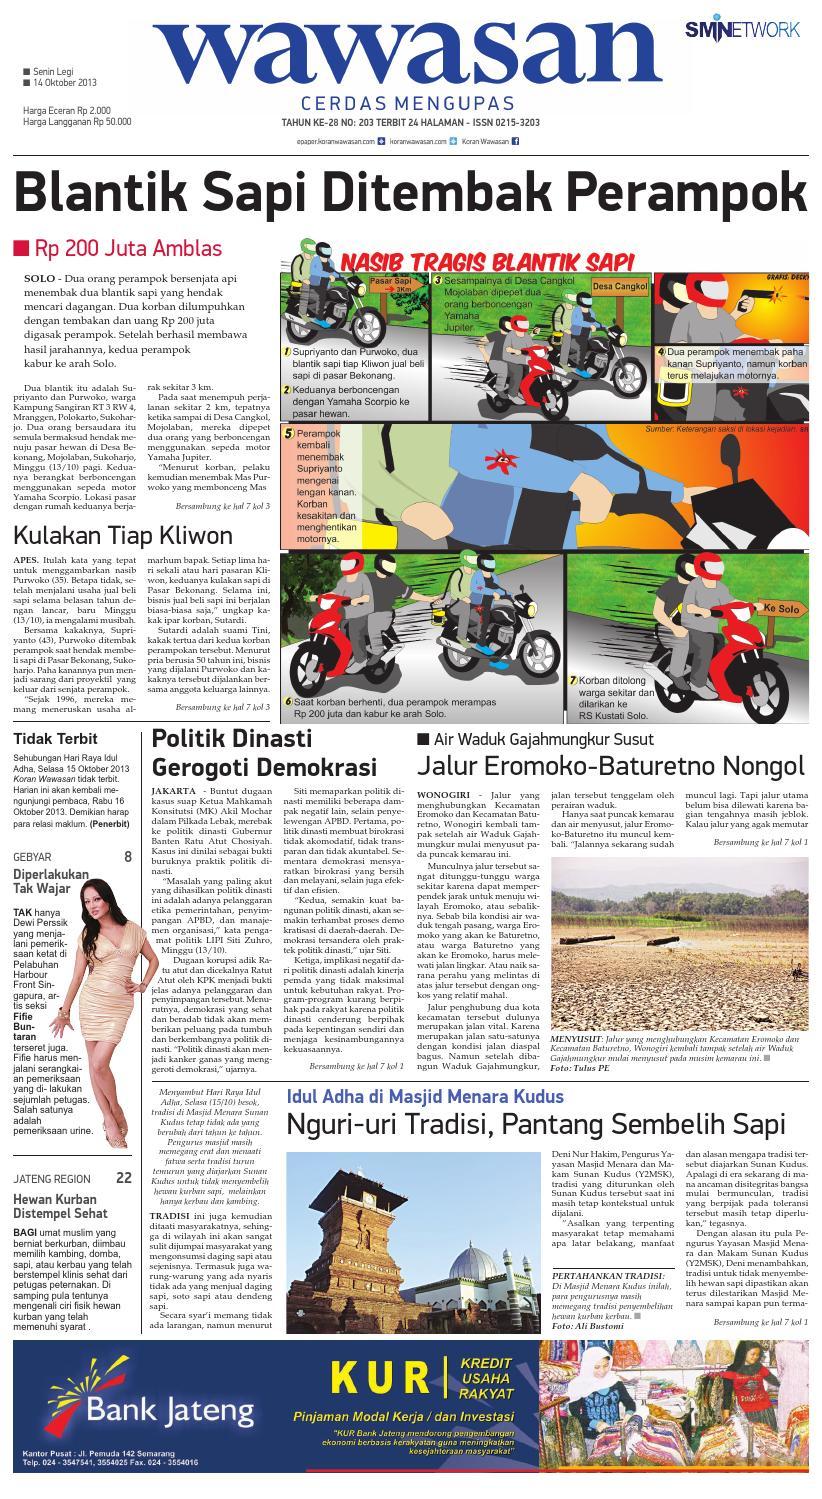 Wawasan 14 Oktober 2013 By Koran Pagi Issuu Produk Ukm Bumn Kain Batik Eksklusif Lasem Manuk